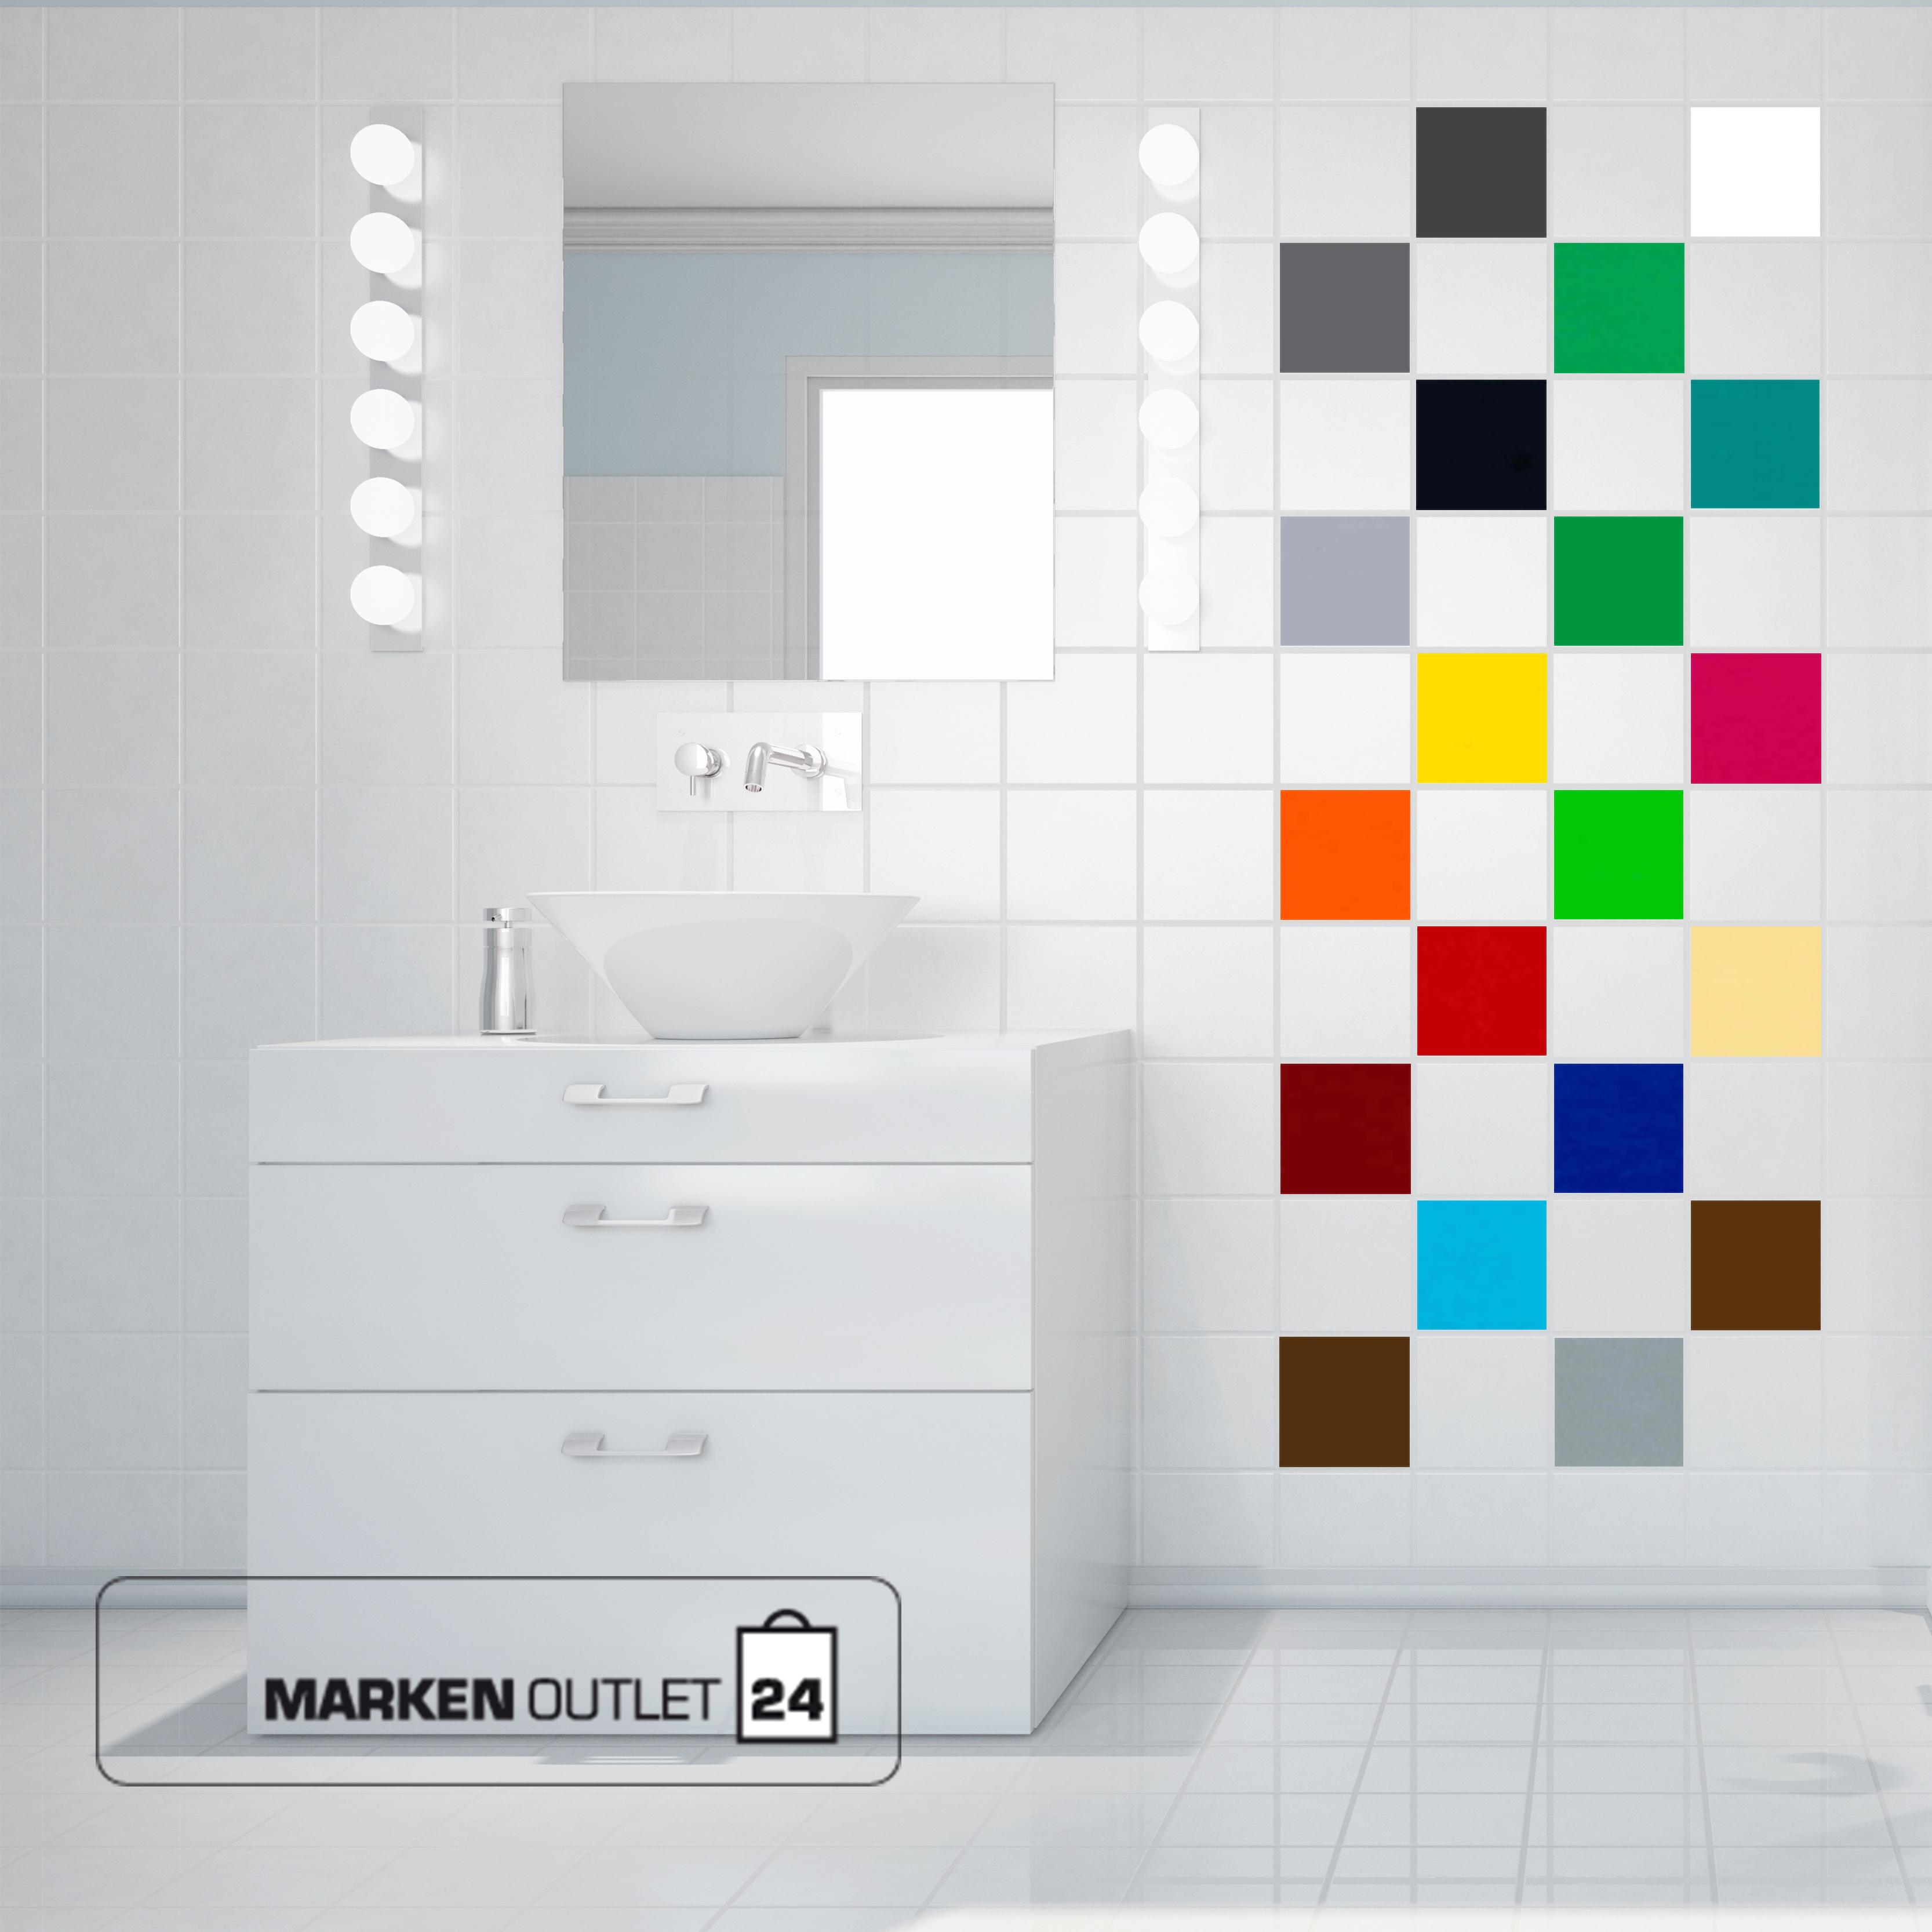 fliesenaufkleber 15 x 15 cm 100 stk kacheldekor fliesendekor k che bad fliesen ebay. Black Bedroom Furniture Sets. Home Design Ideas